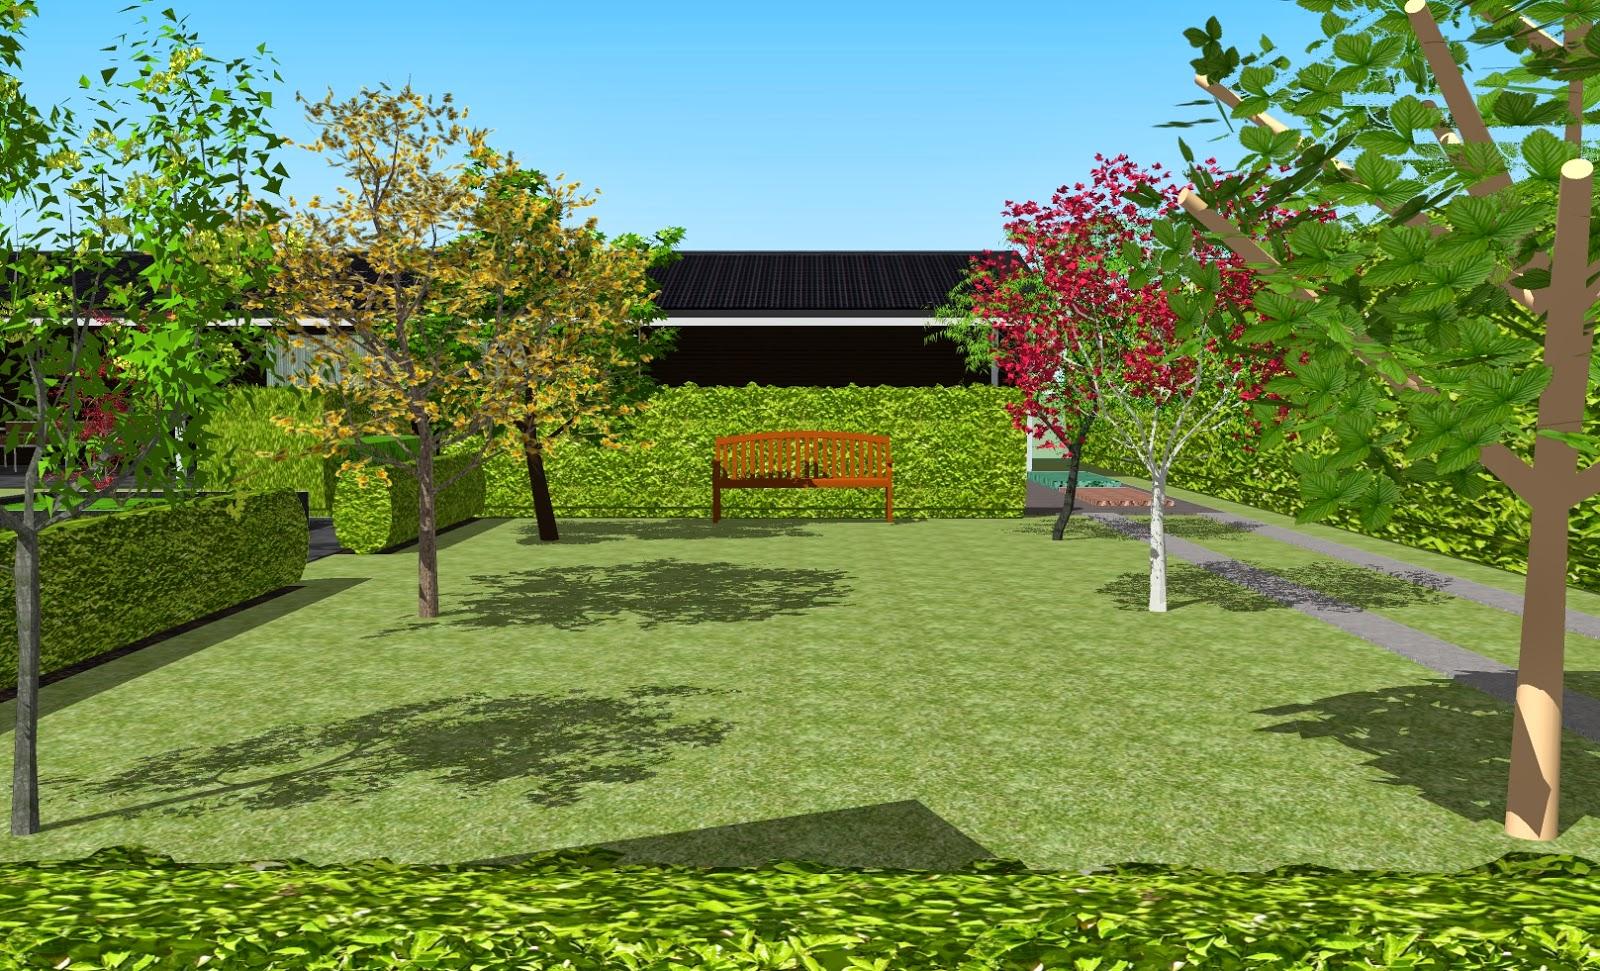 Huis q u a d r a virtuele tuinplannen for Tuin programma